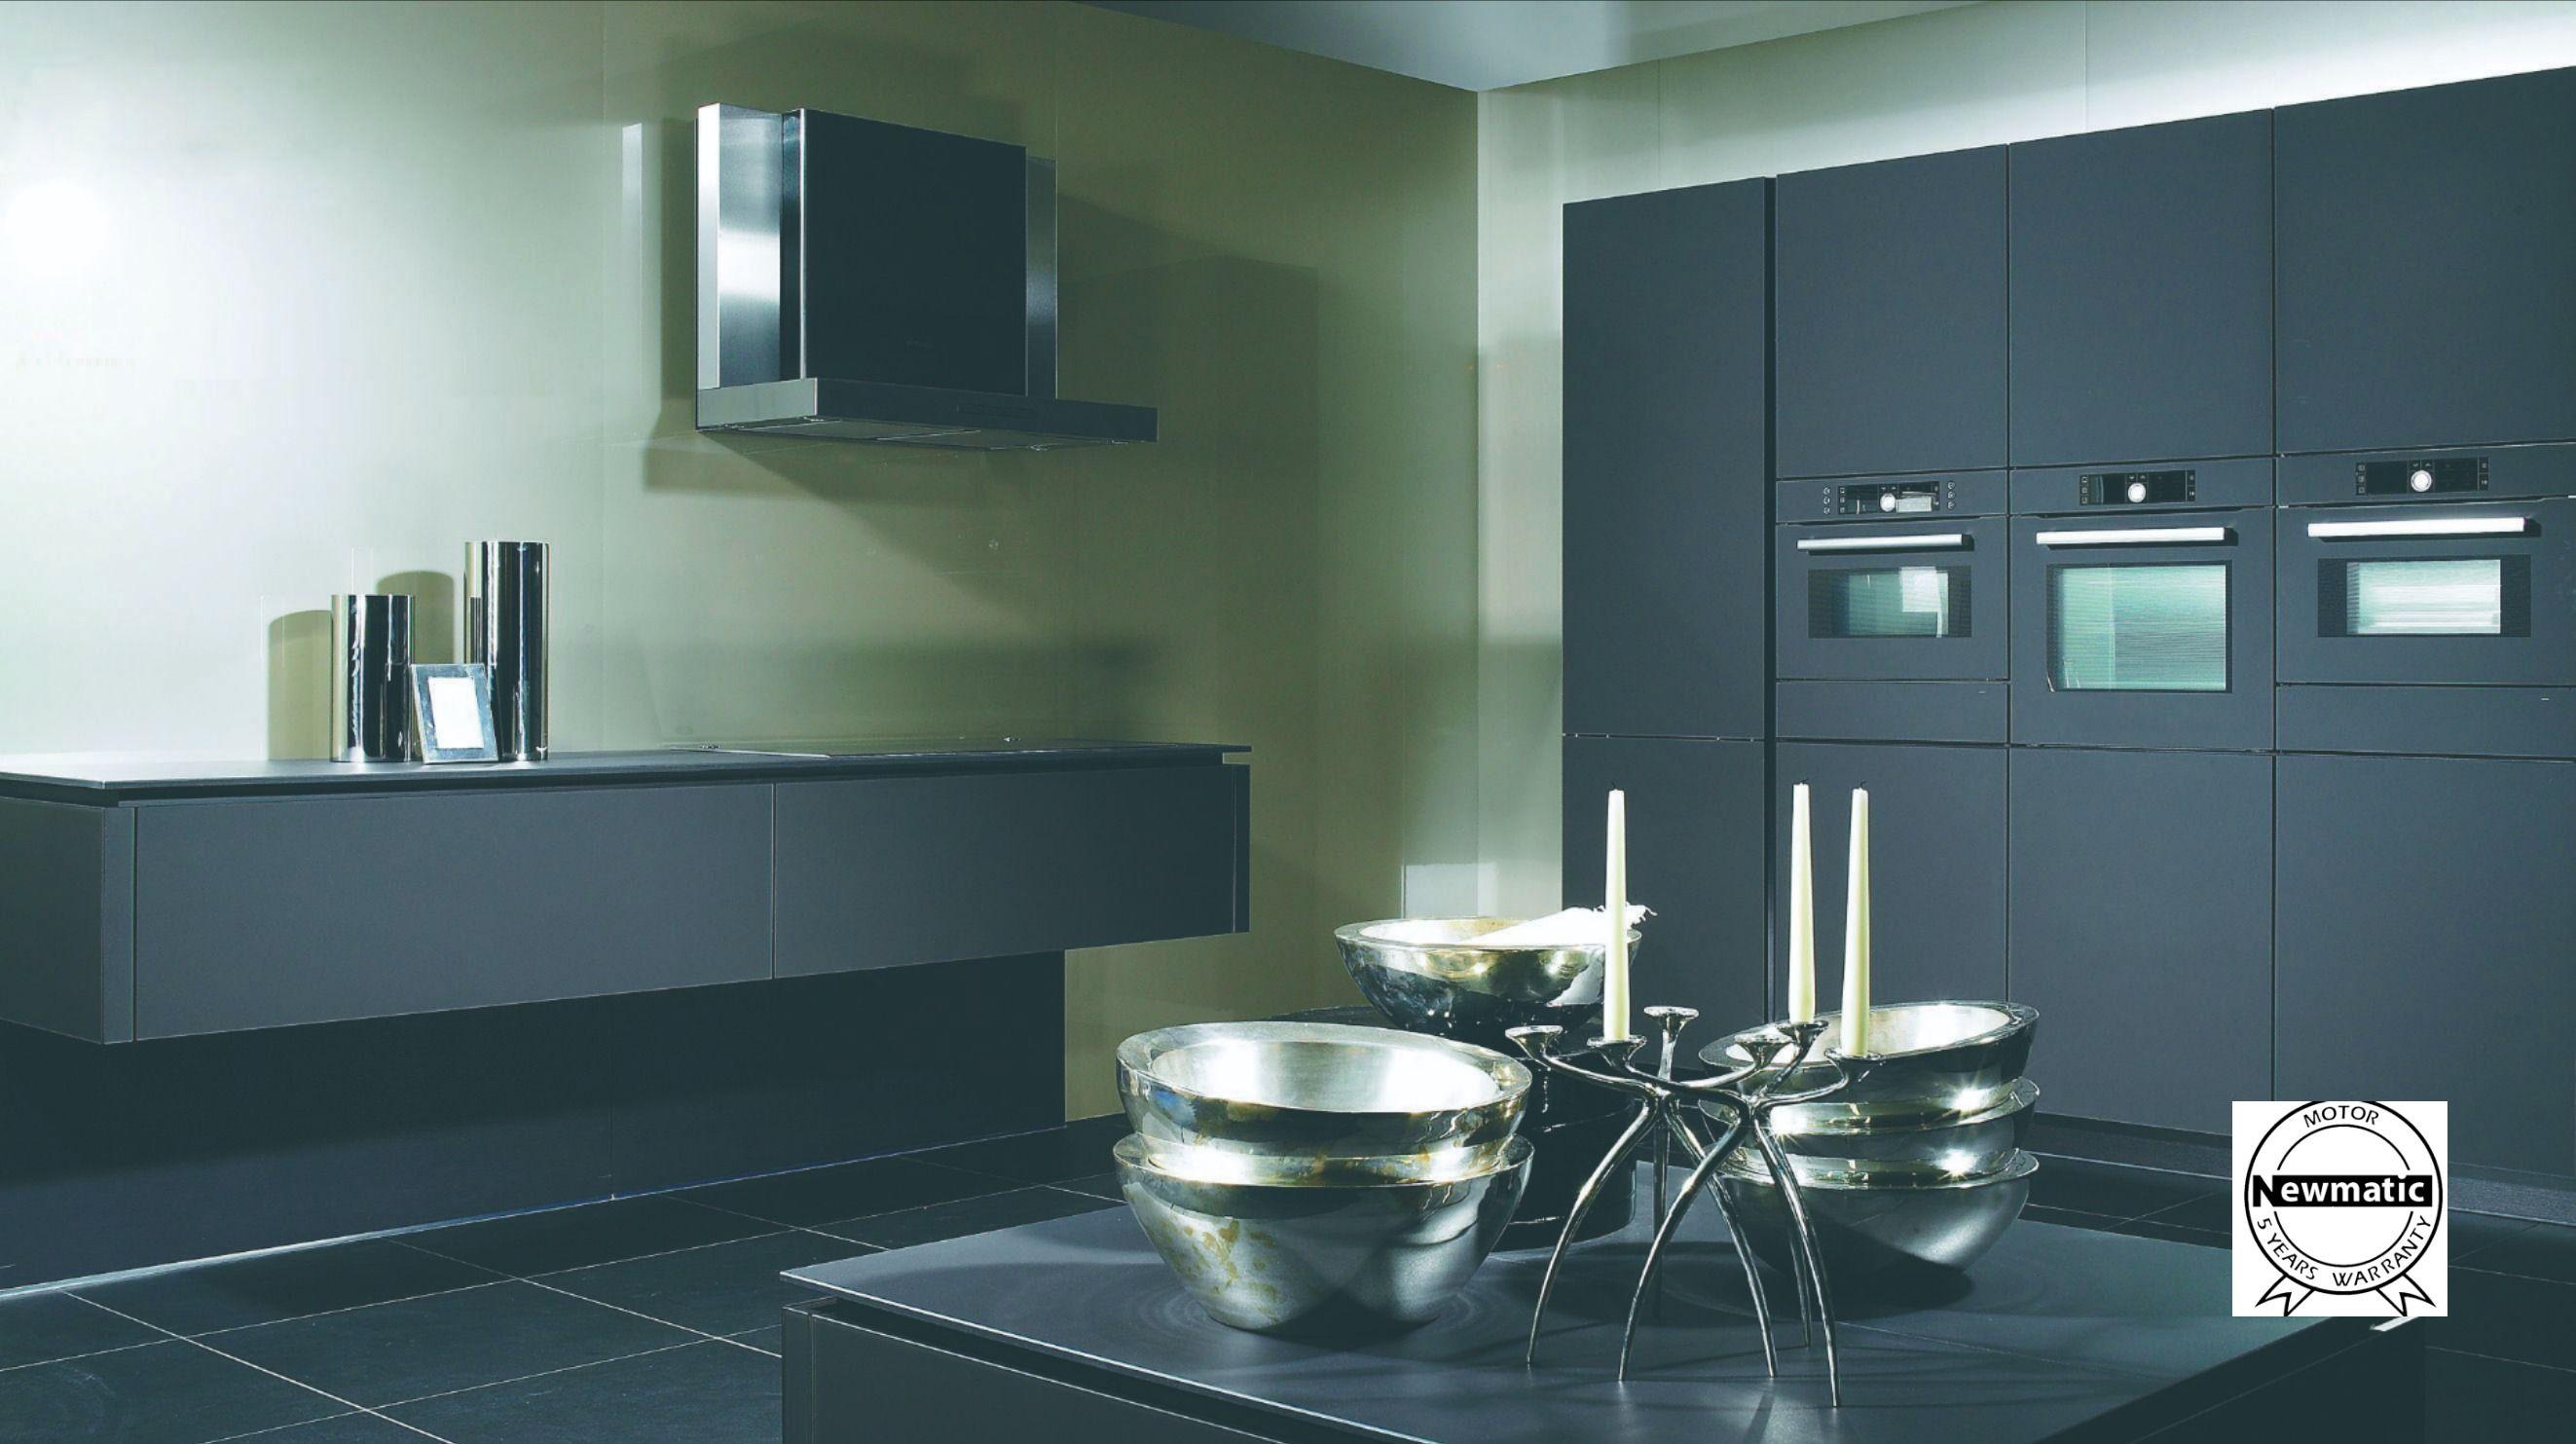 Built-in Appliances in Kenya | Built in kitchen appliances ...